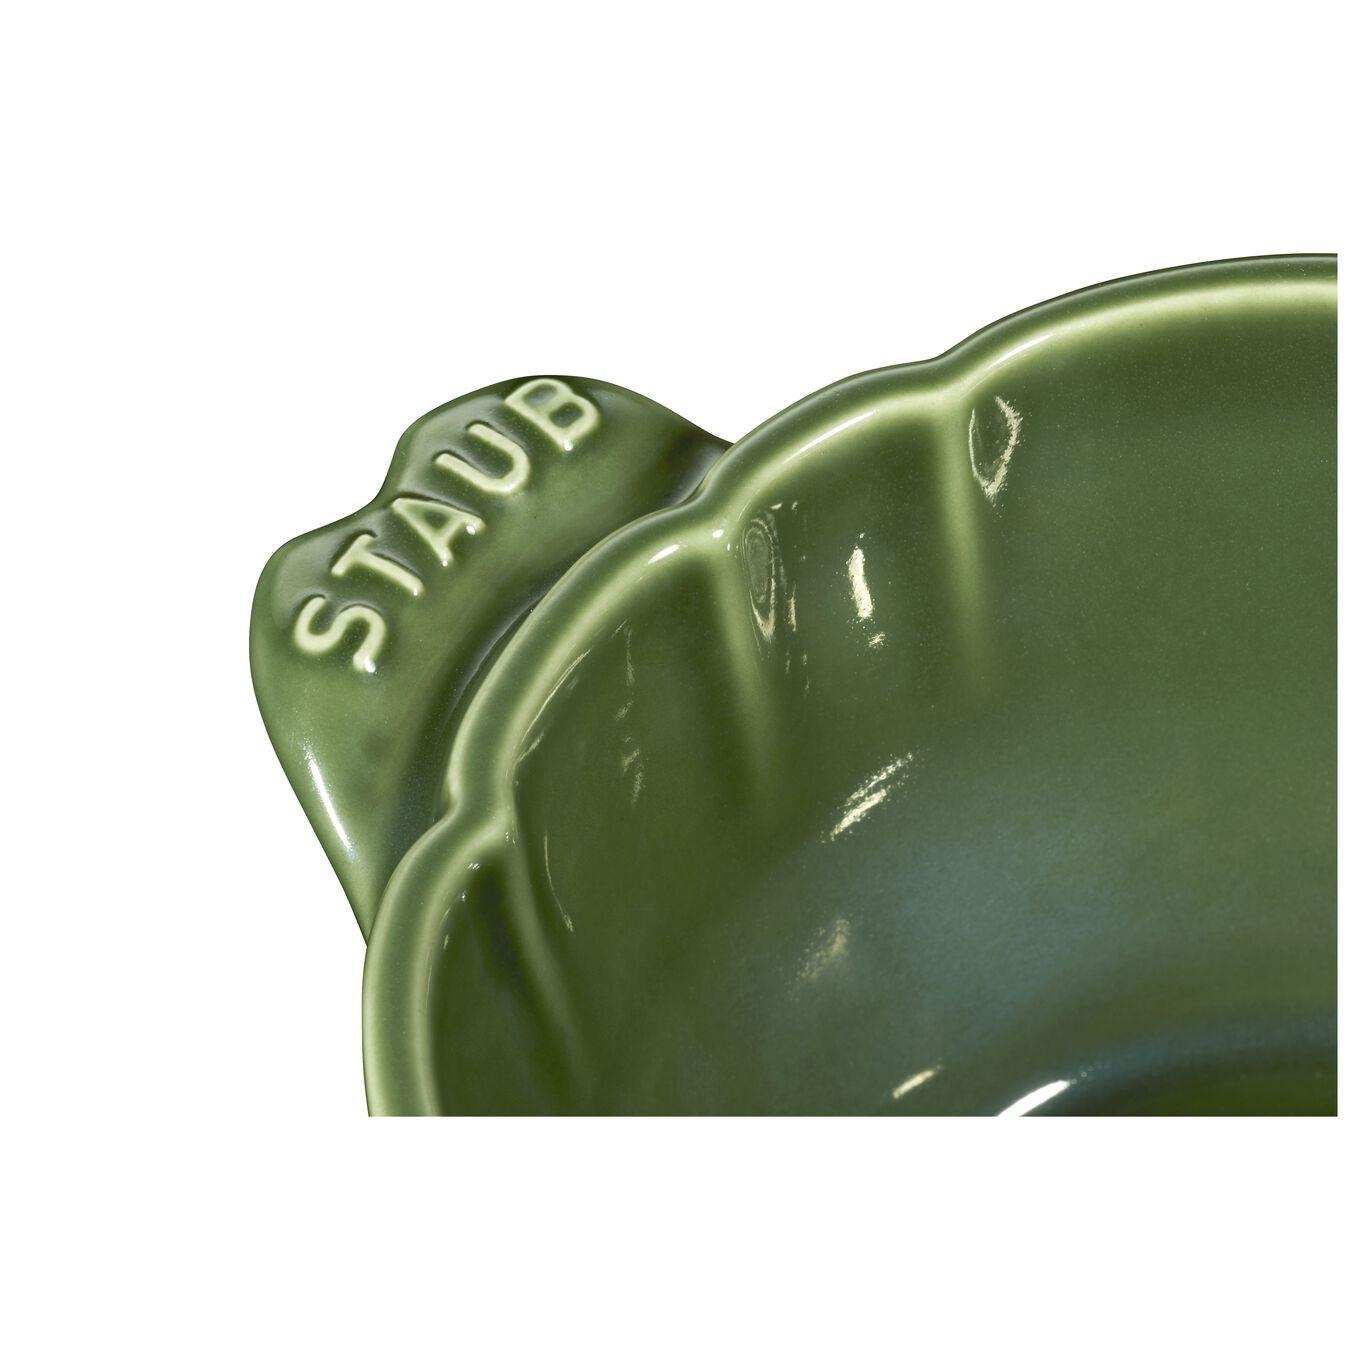 Cocotte 13 cm, Artischocke, Basilikum-Grün, Keramik,,large 12